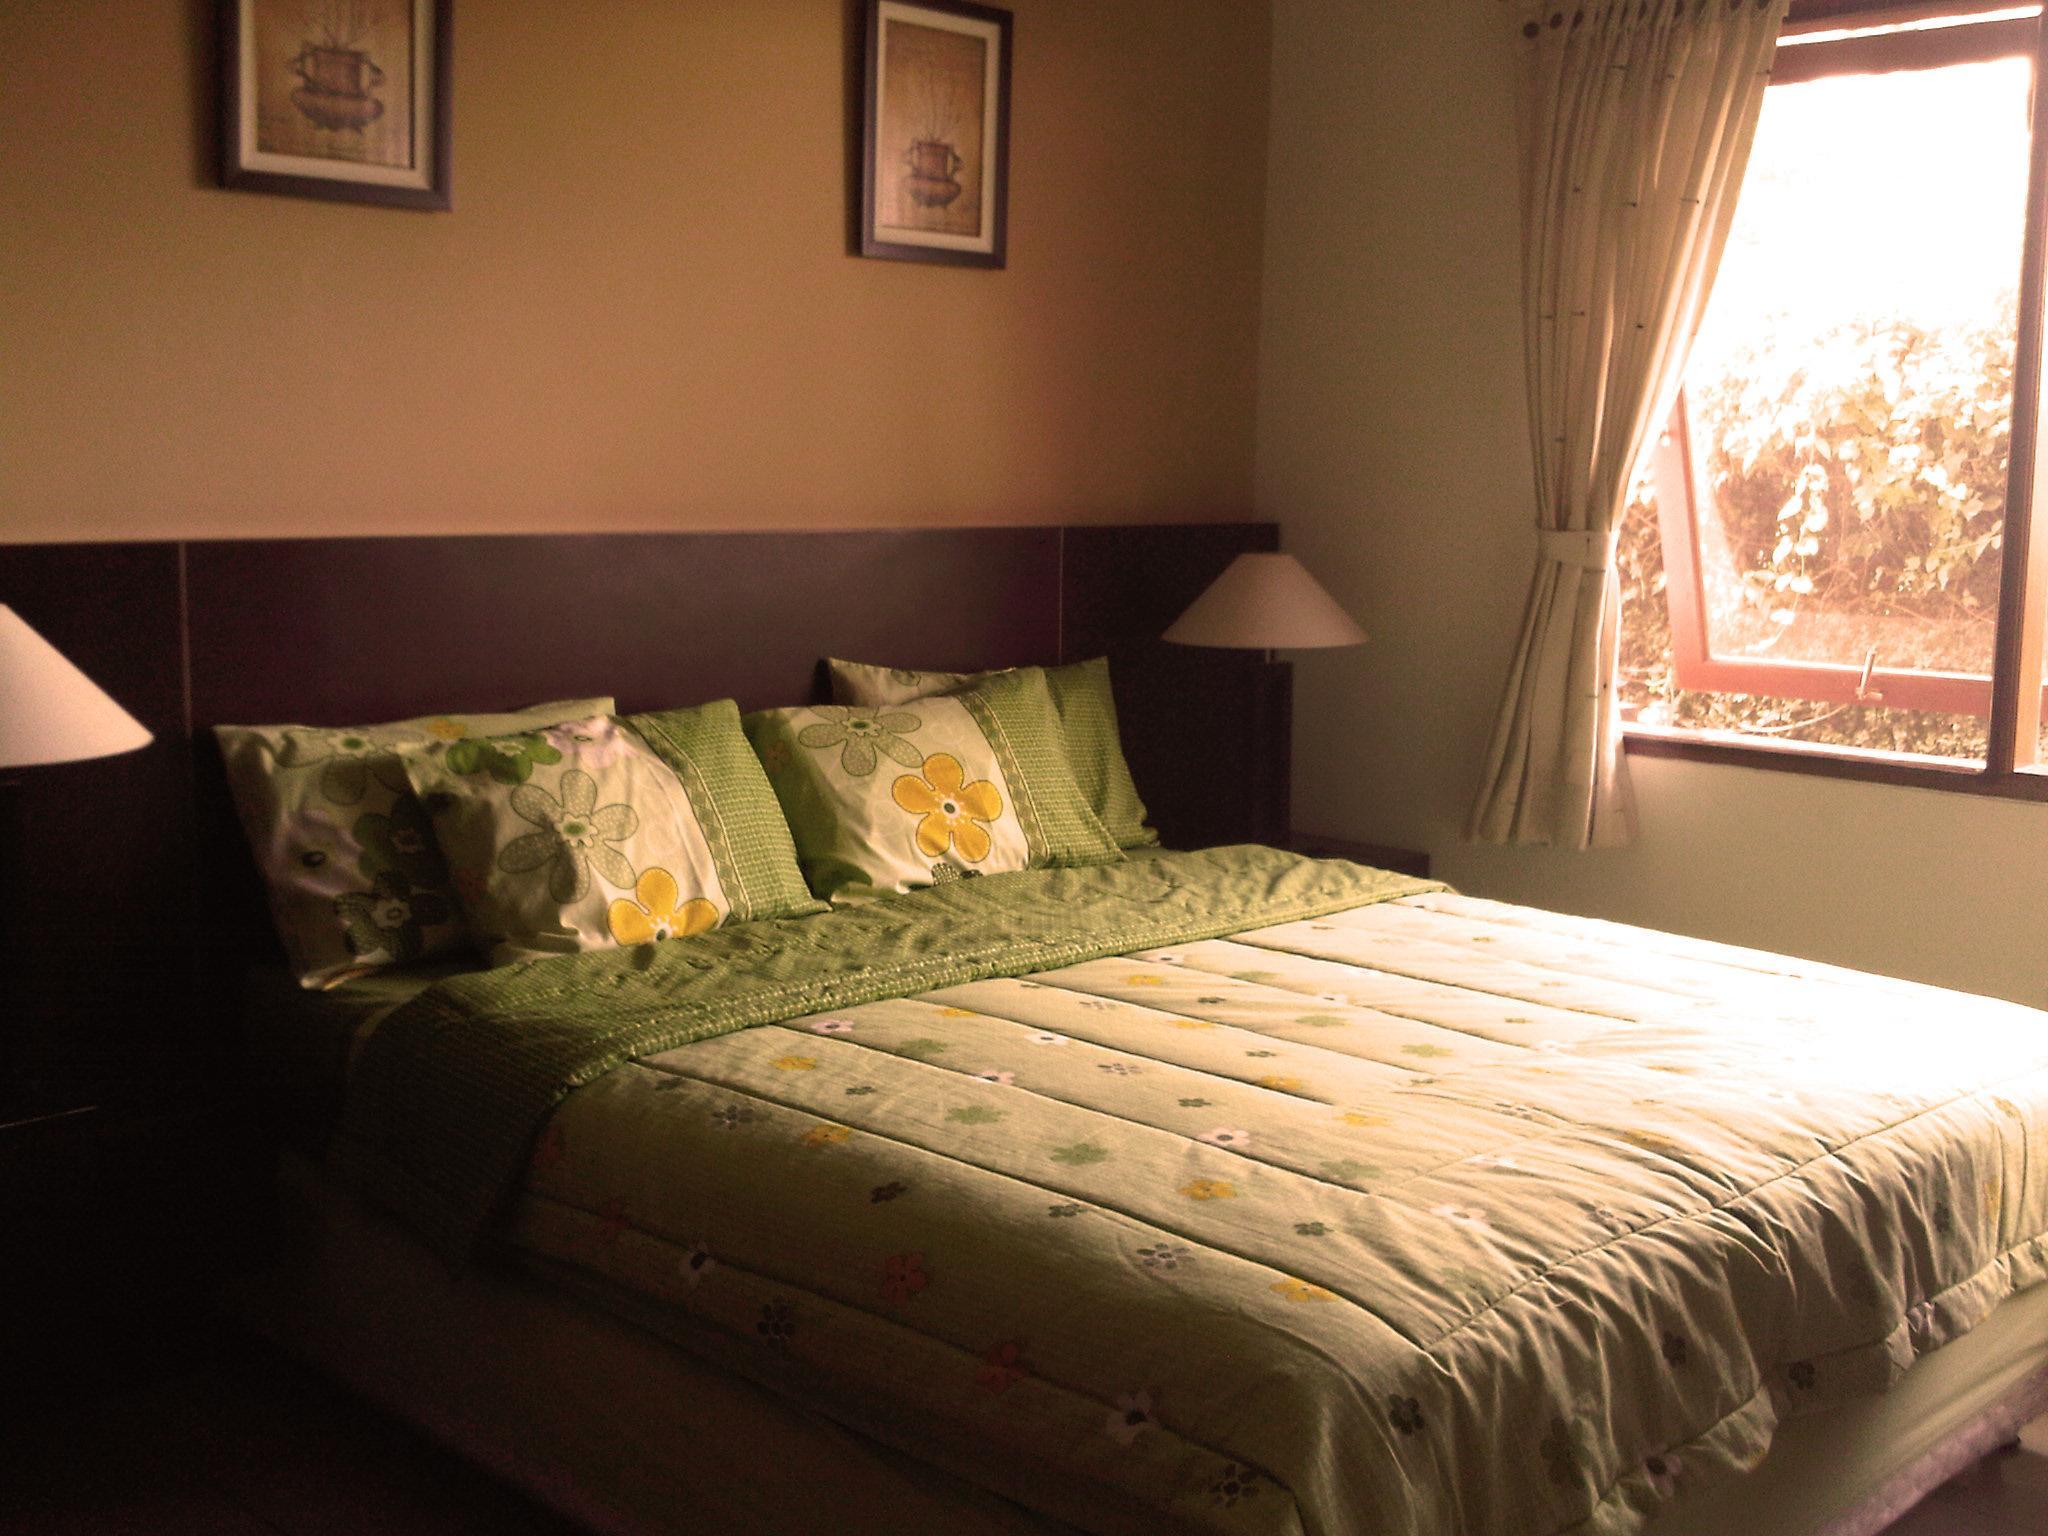 Hotel 1 Bedroom Apartment - De Hill Villa 1 - Jalan Hegarsari Raya 5 - Bandung